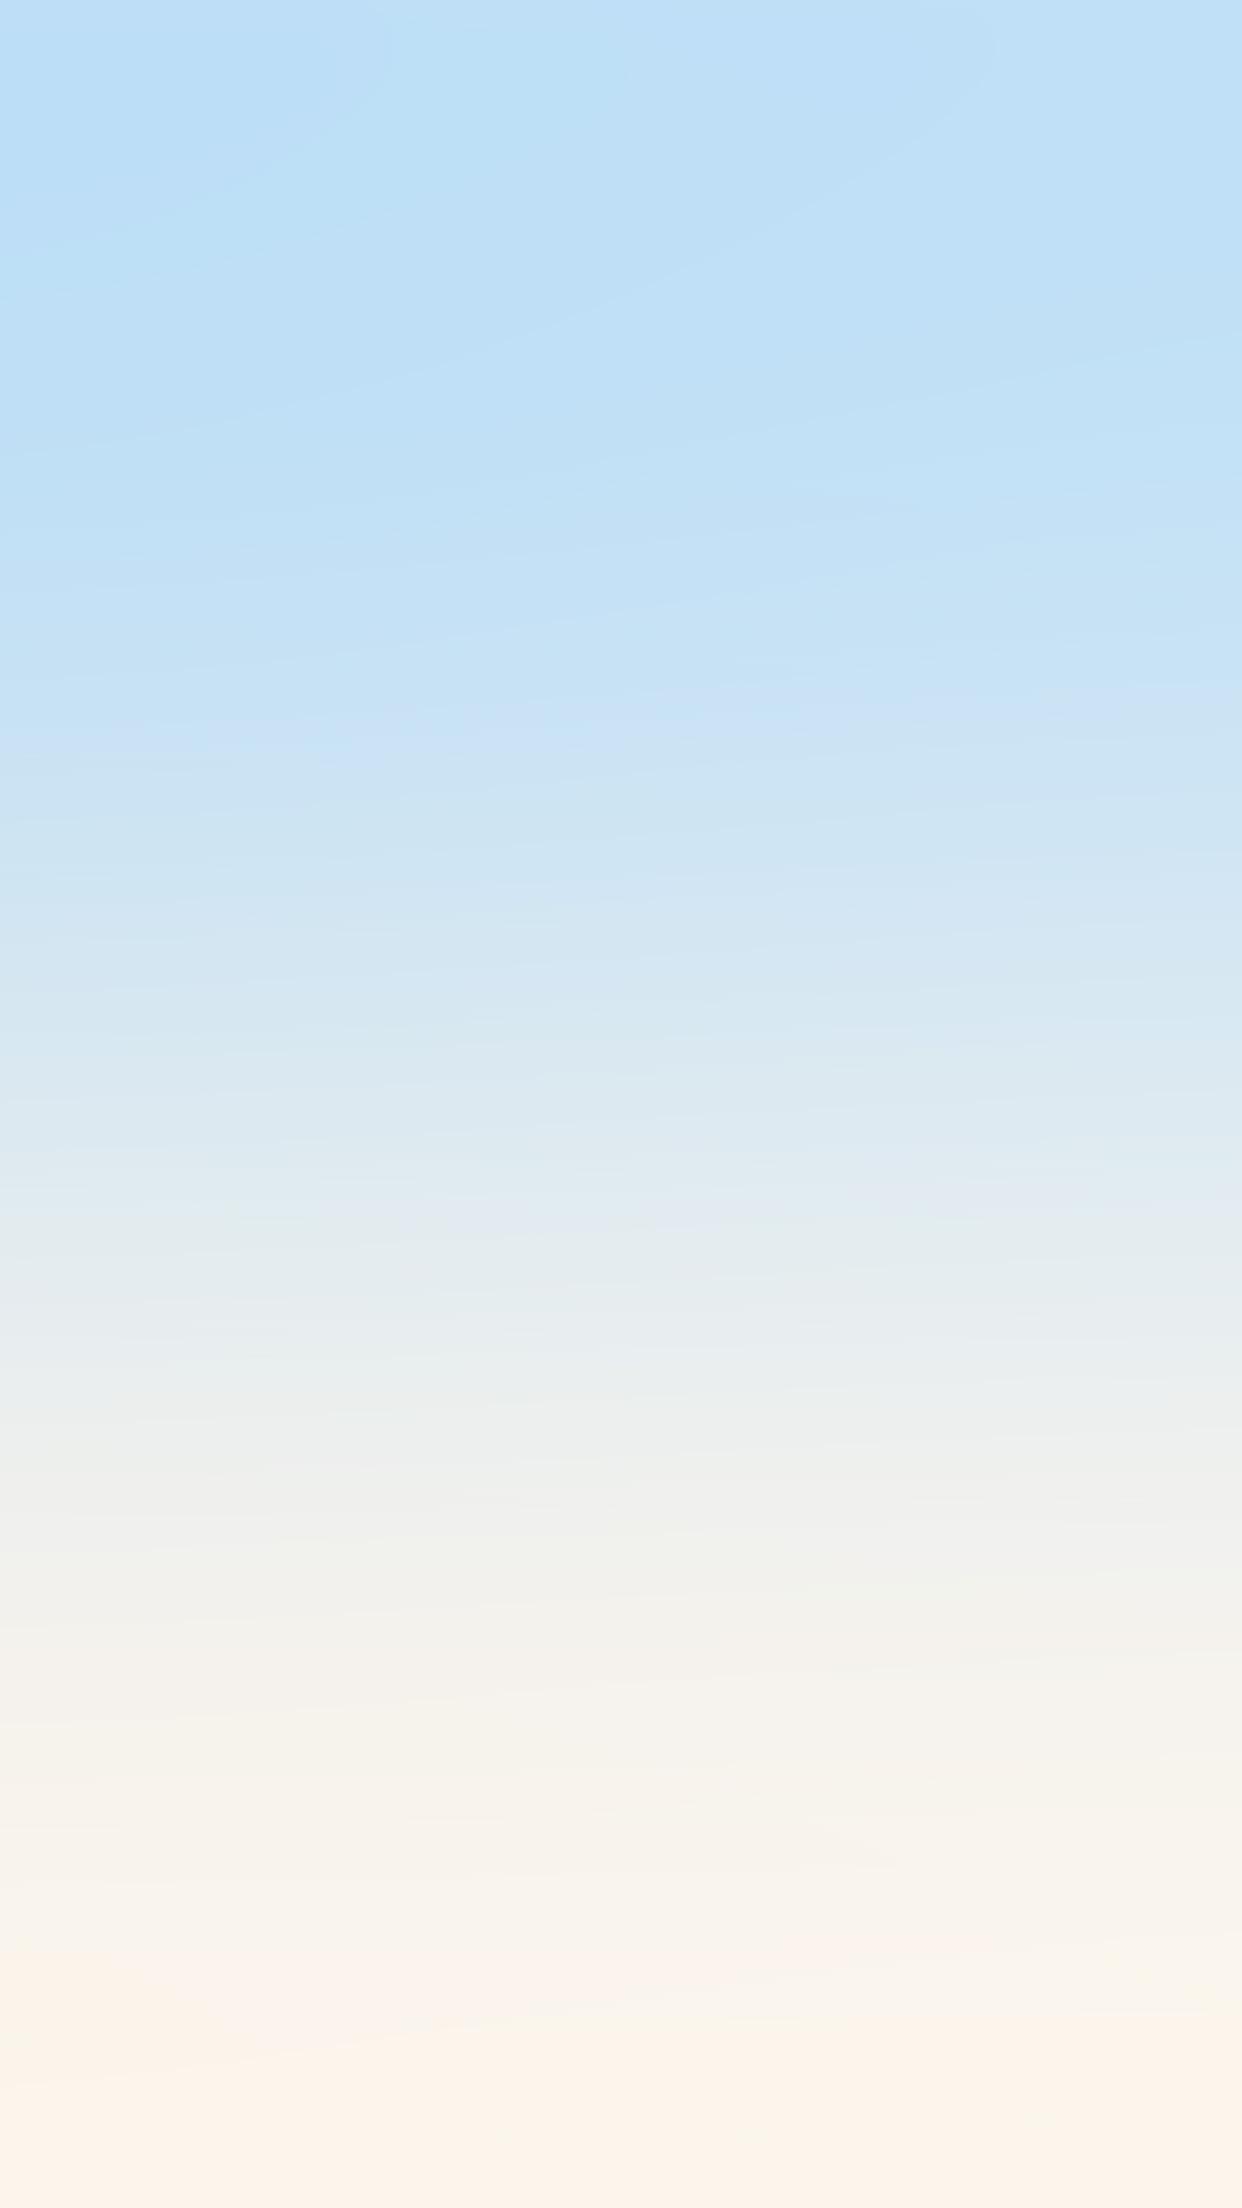 Iphone6papers Com Iphone 6 Wallpaper Sl96 Soft Blue Pastel Blur